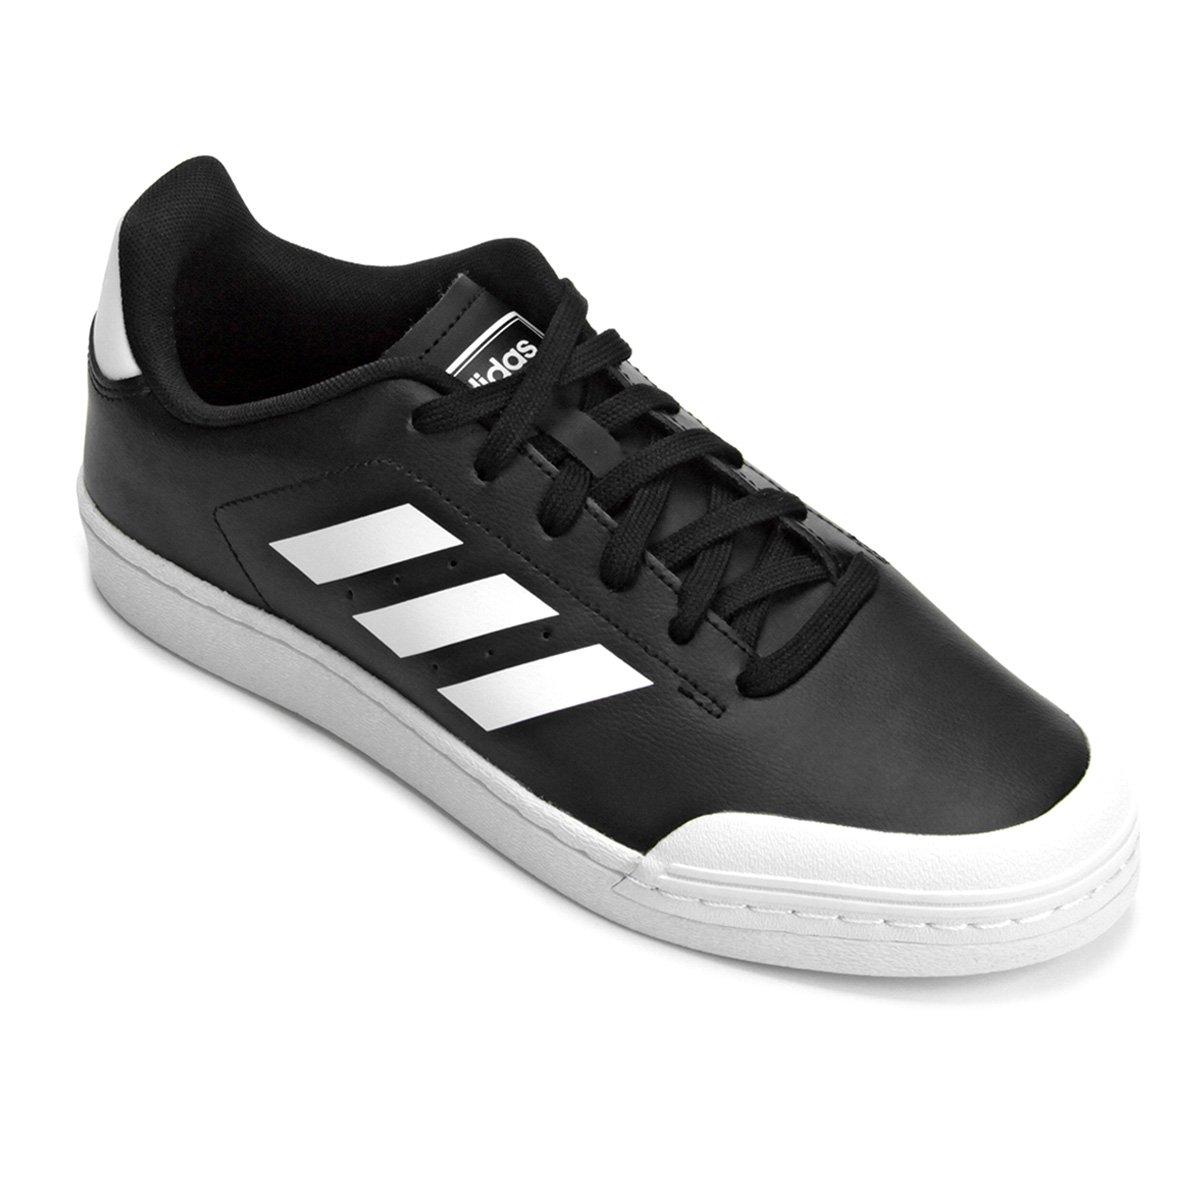 10b88f25201 Tênis Adidas Retro Court Wild Card Masculino - Branco e Preto - Compre  Agora